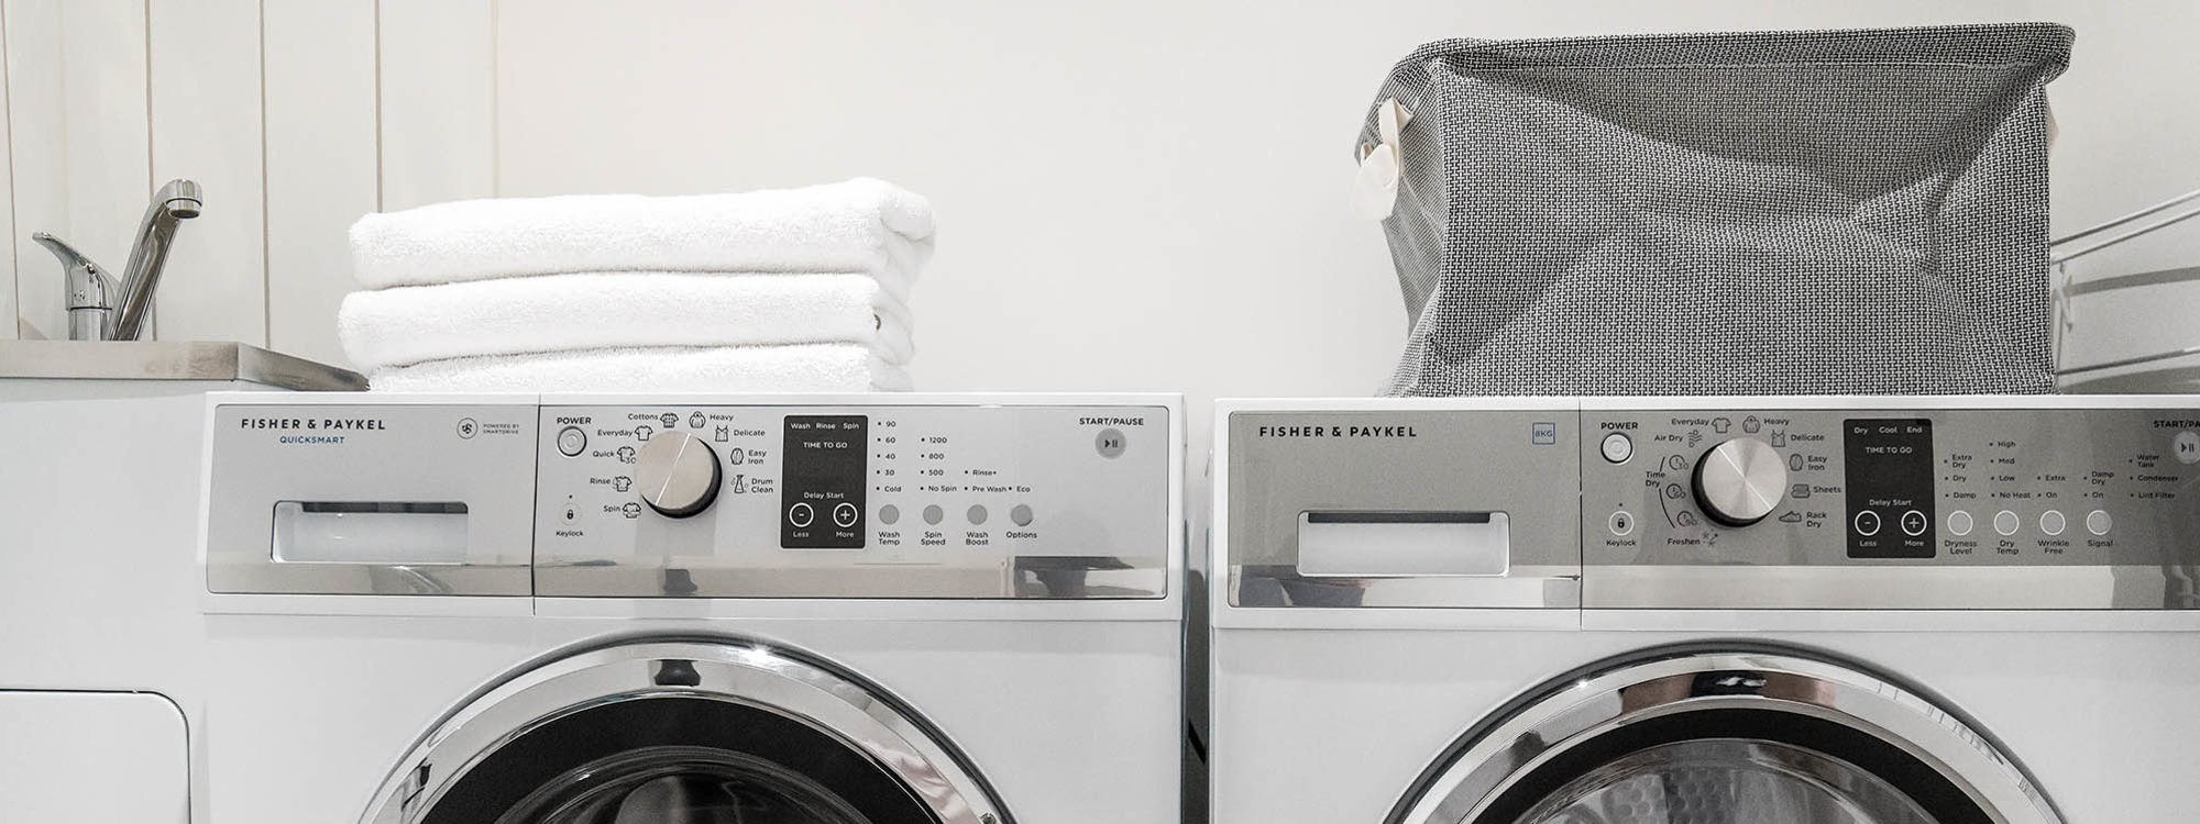 Axel Apartments 203 The Bonfield - Glen Iris - Laundry